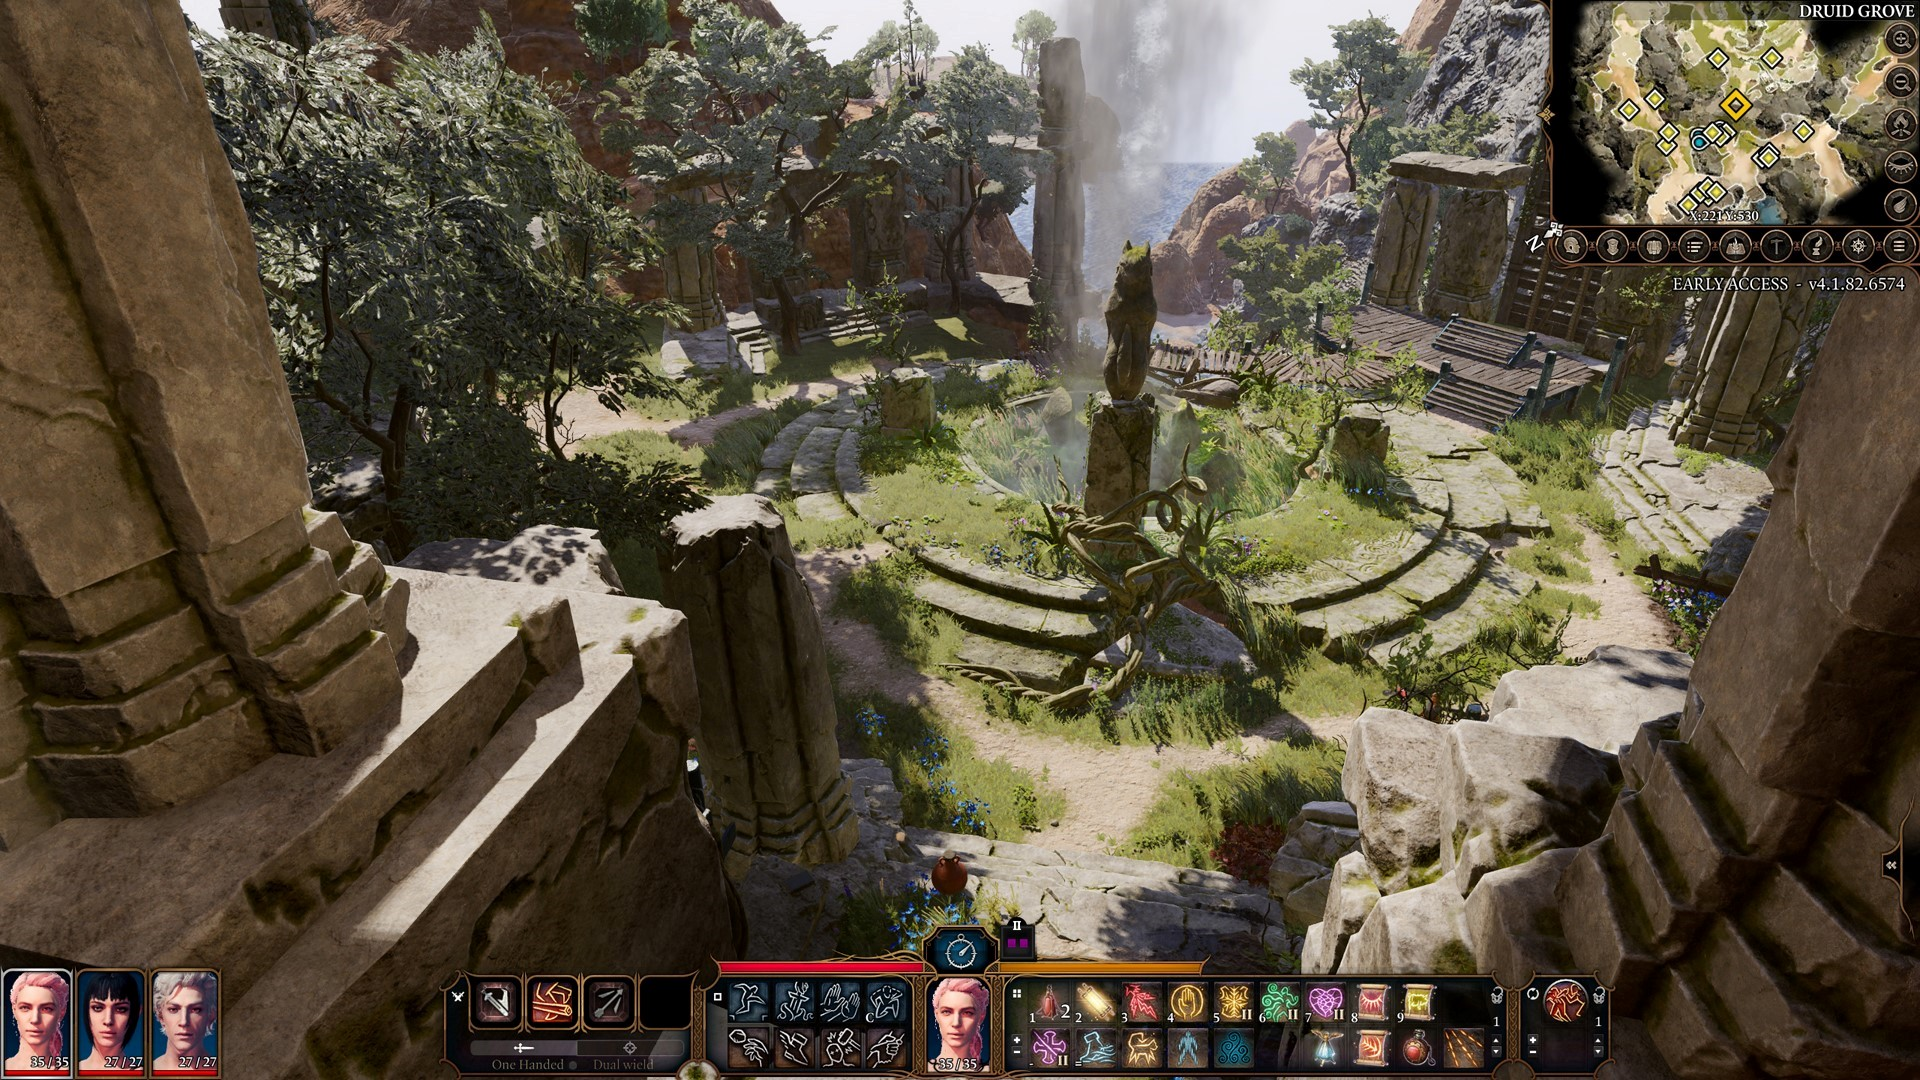 Exploration-Druids-Grove